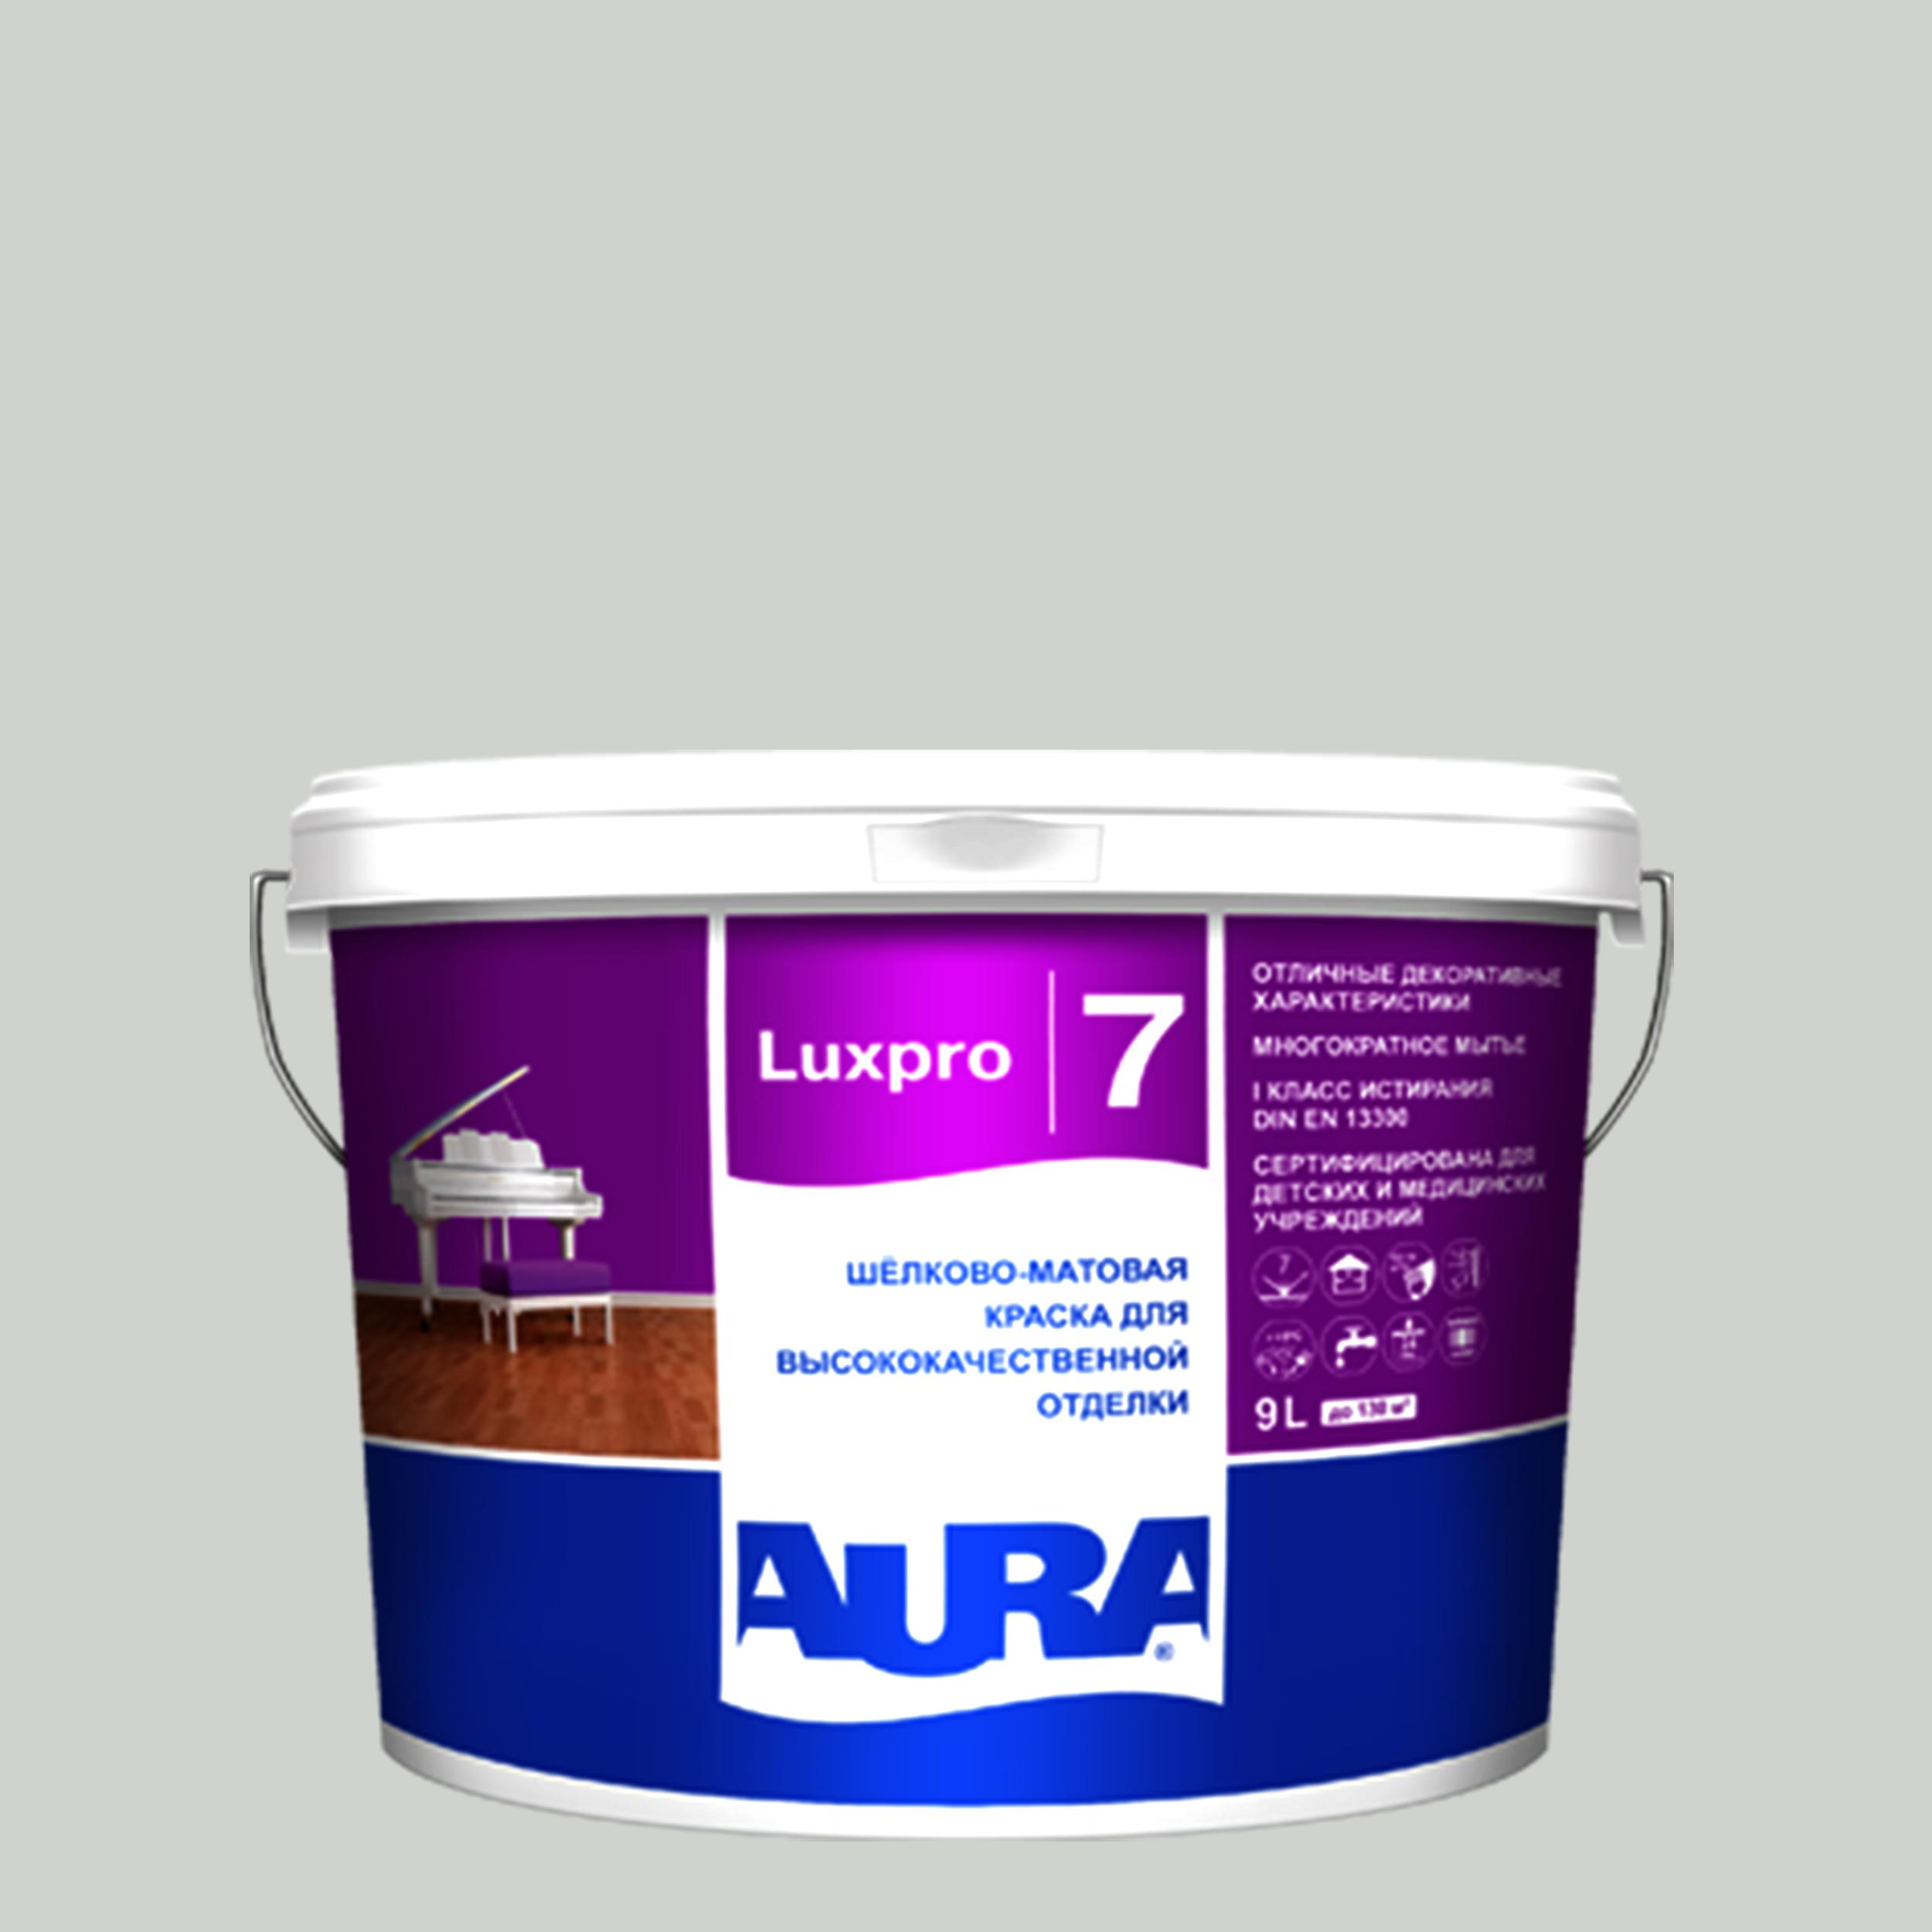 Фото 4 - Краска интерьерная, Aura LuxPRO 7, RAL 3015, 11 кг.